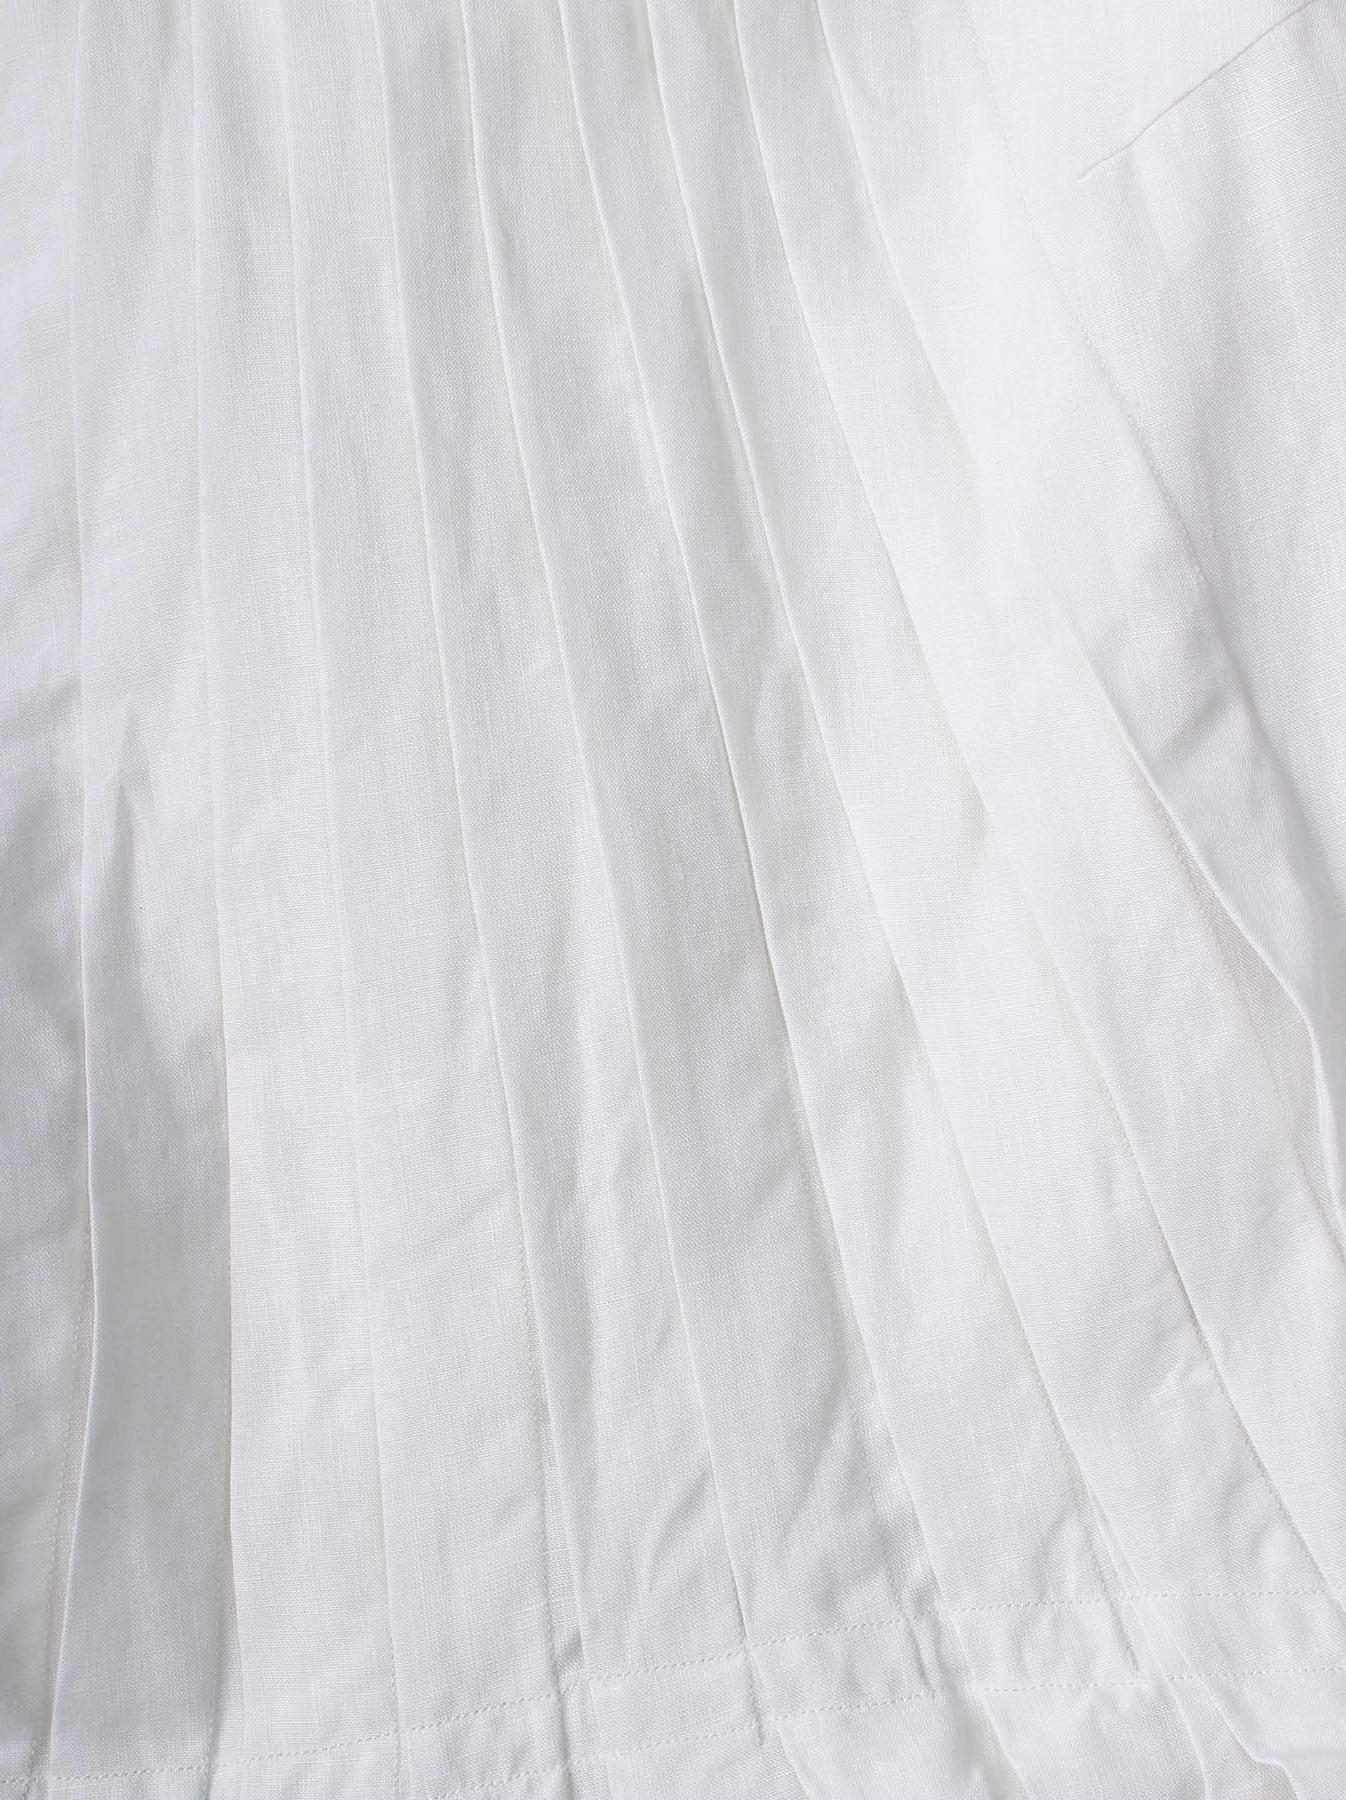 WH Linen Sleeveless Tuck Dress-6